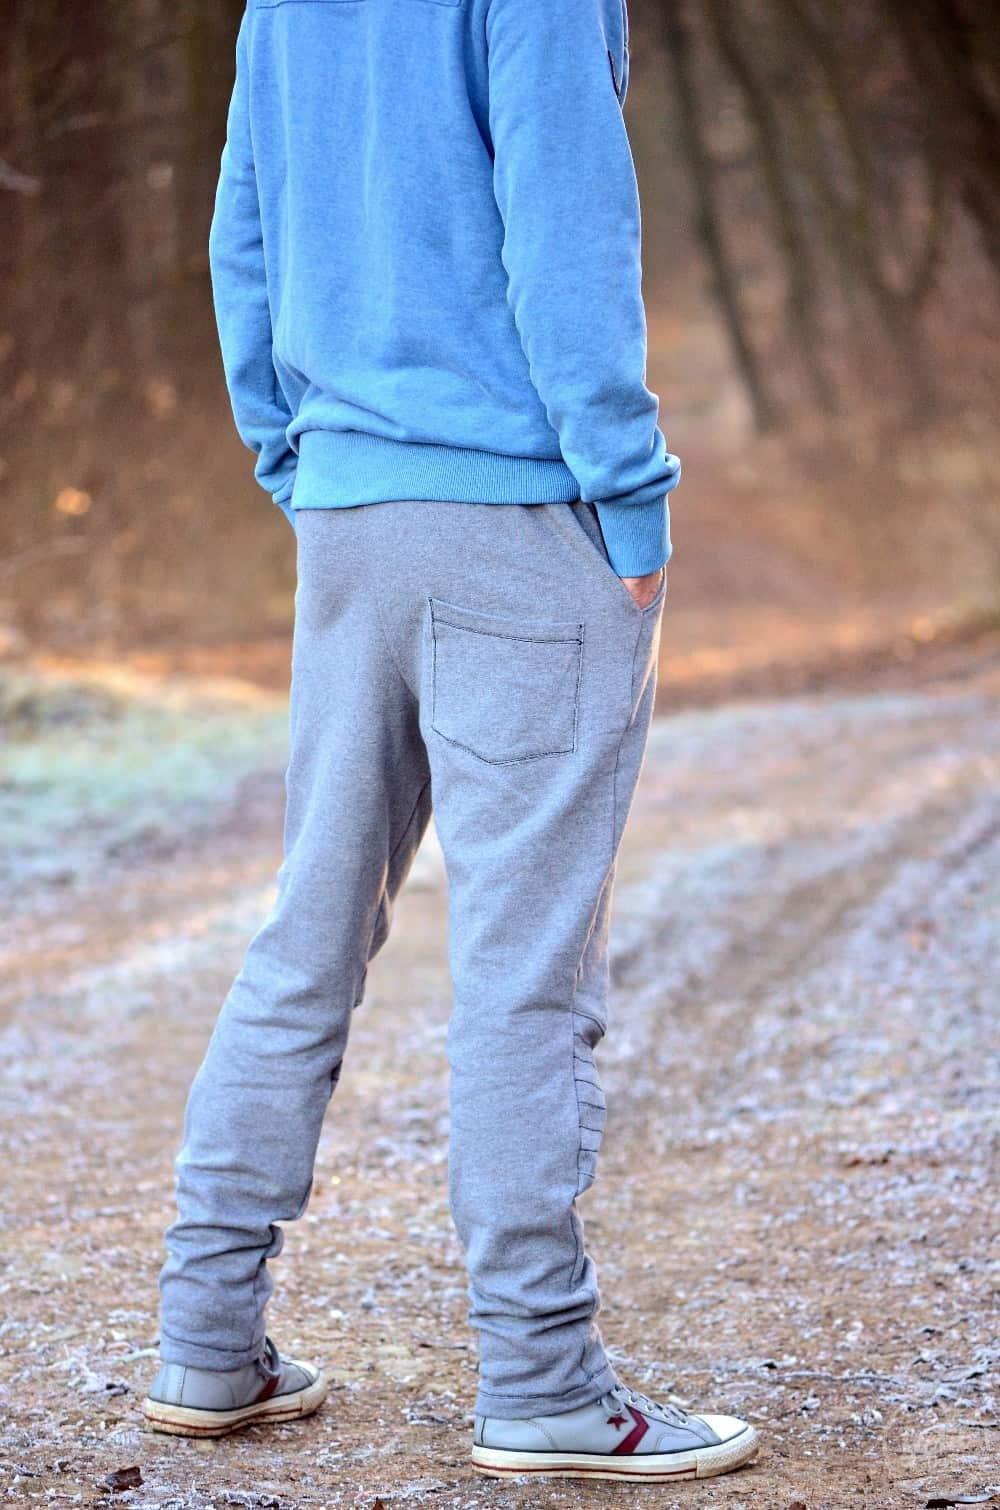 Schnittmuster Hose: Jogginghose nähen - Bild 10 | textilsucht.de